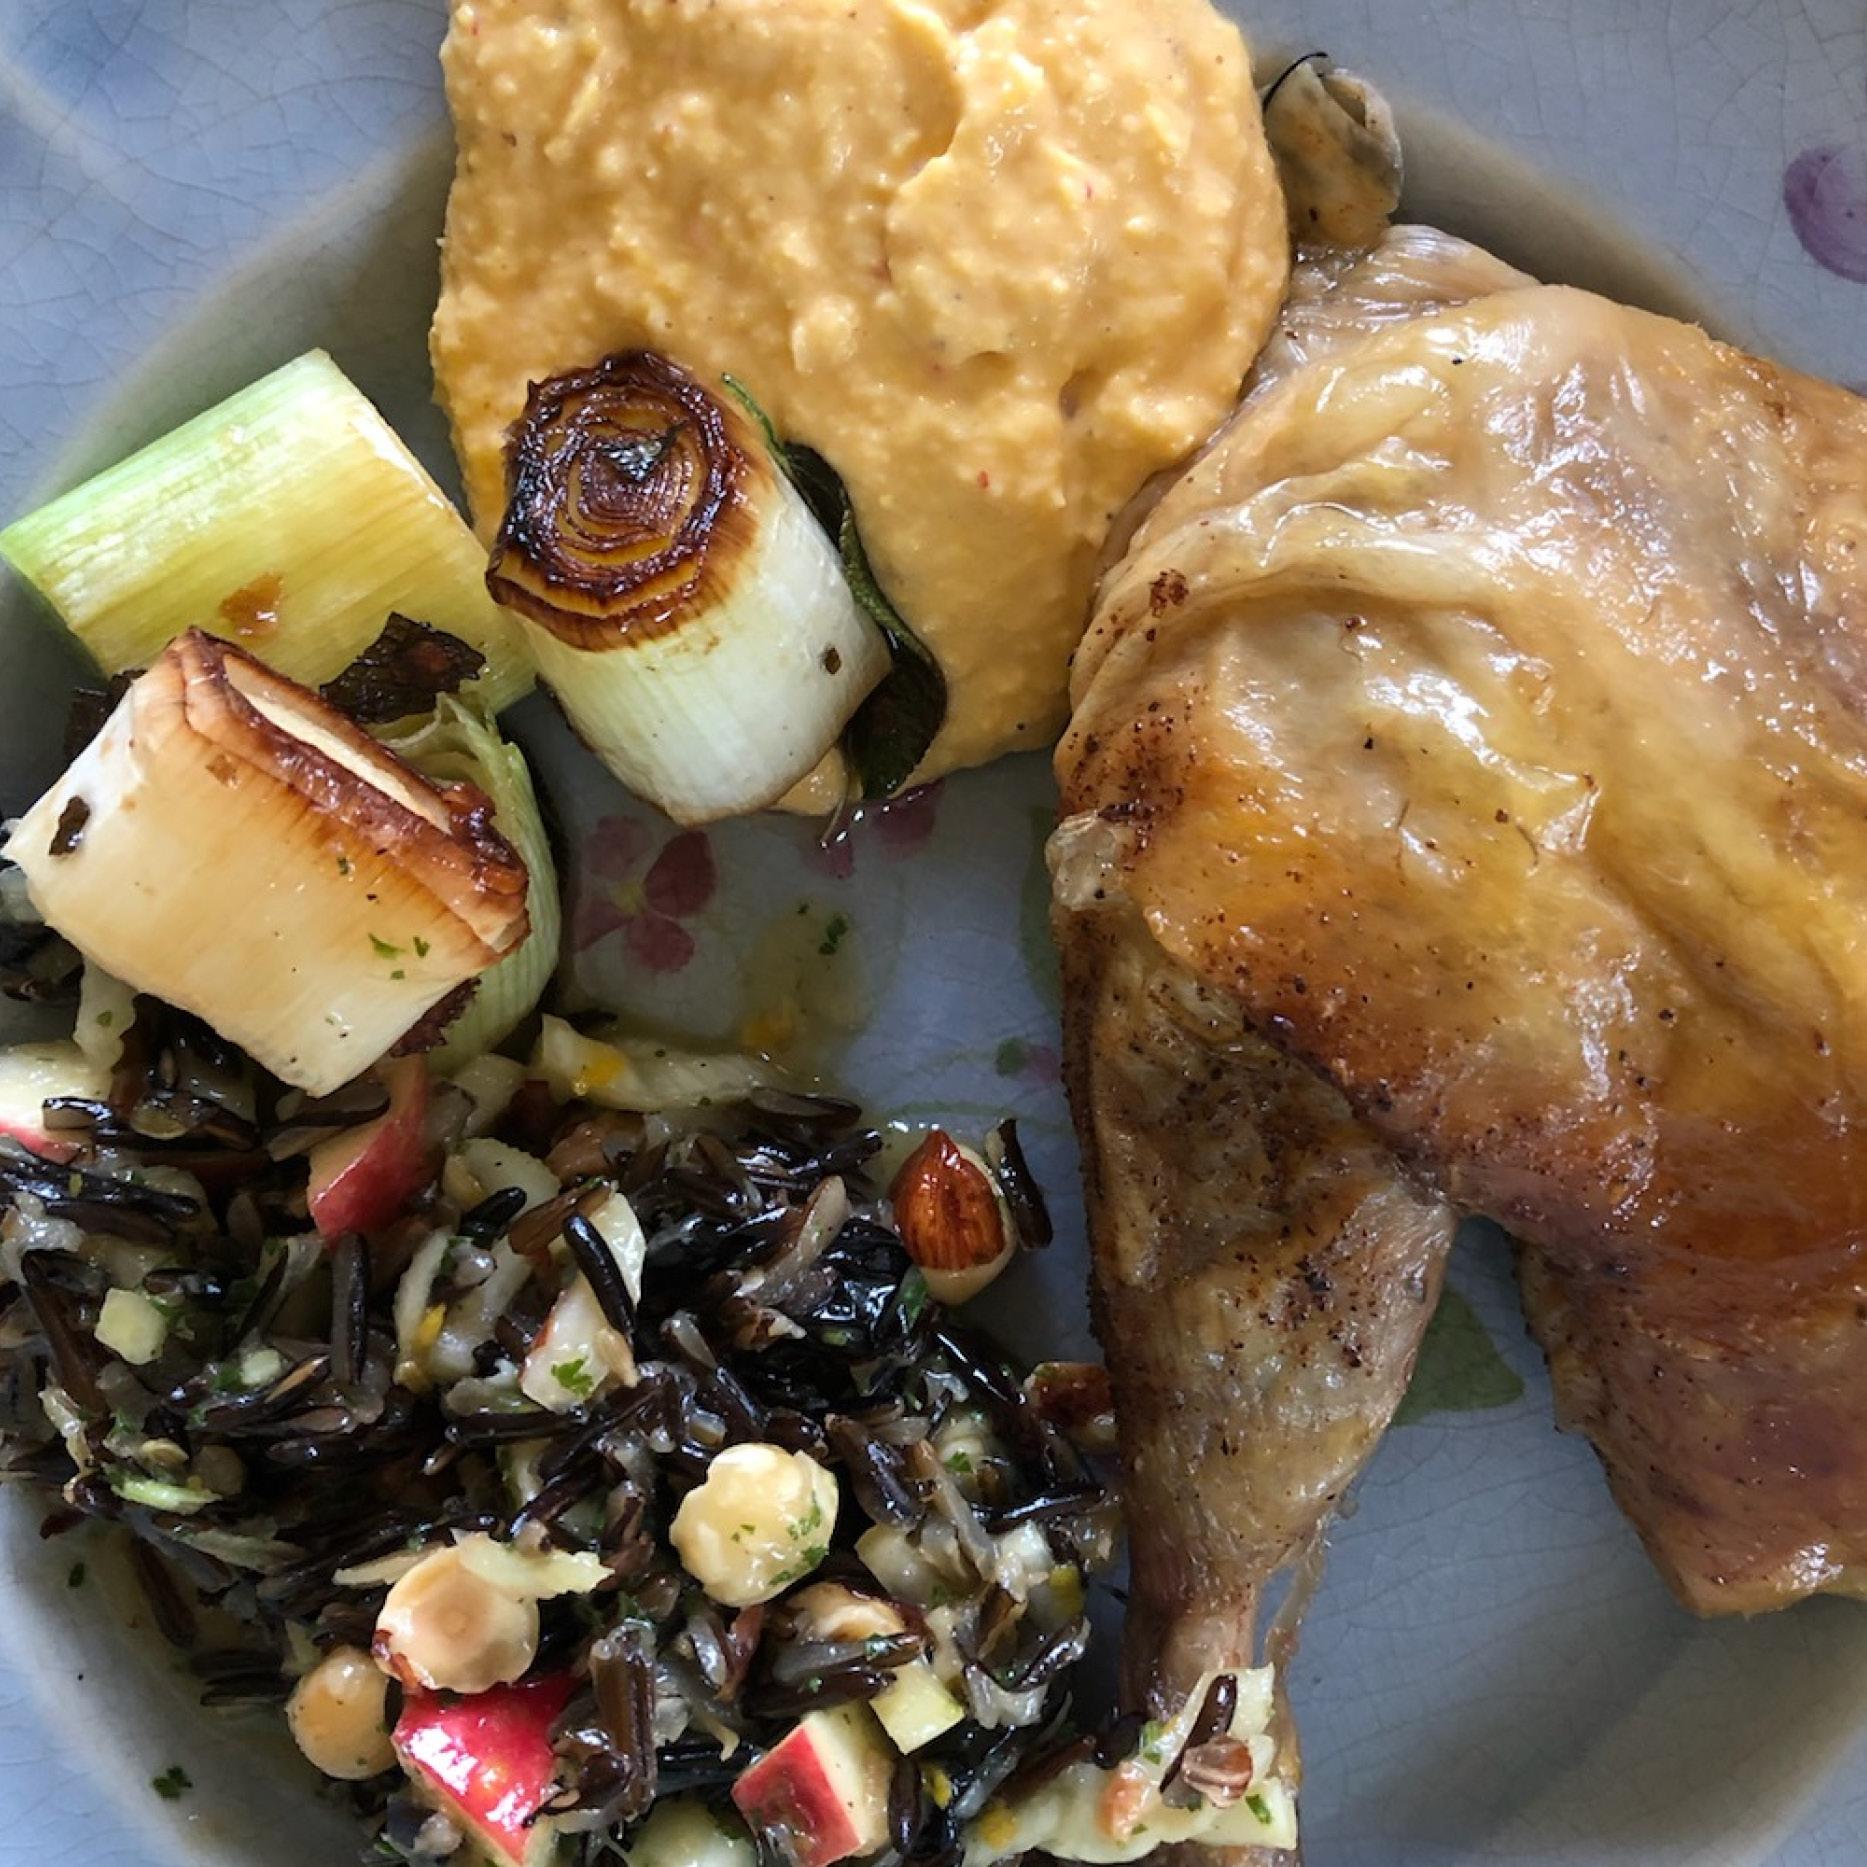 Wild rice salad and Sweet corn sauce